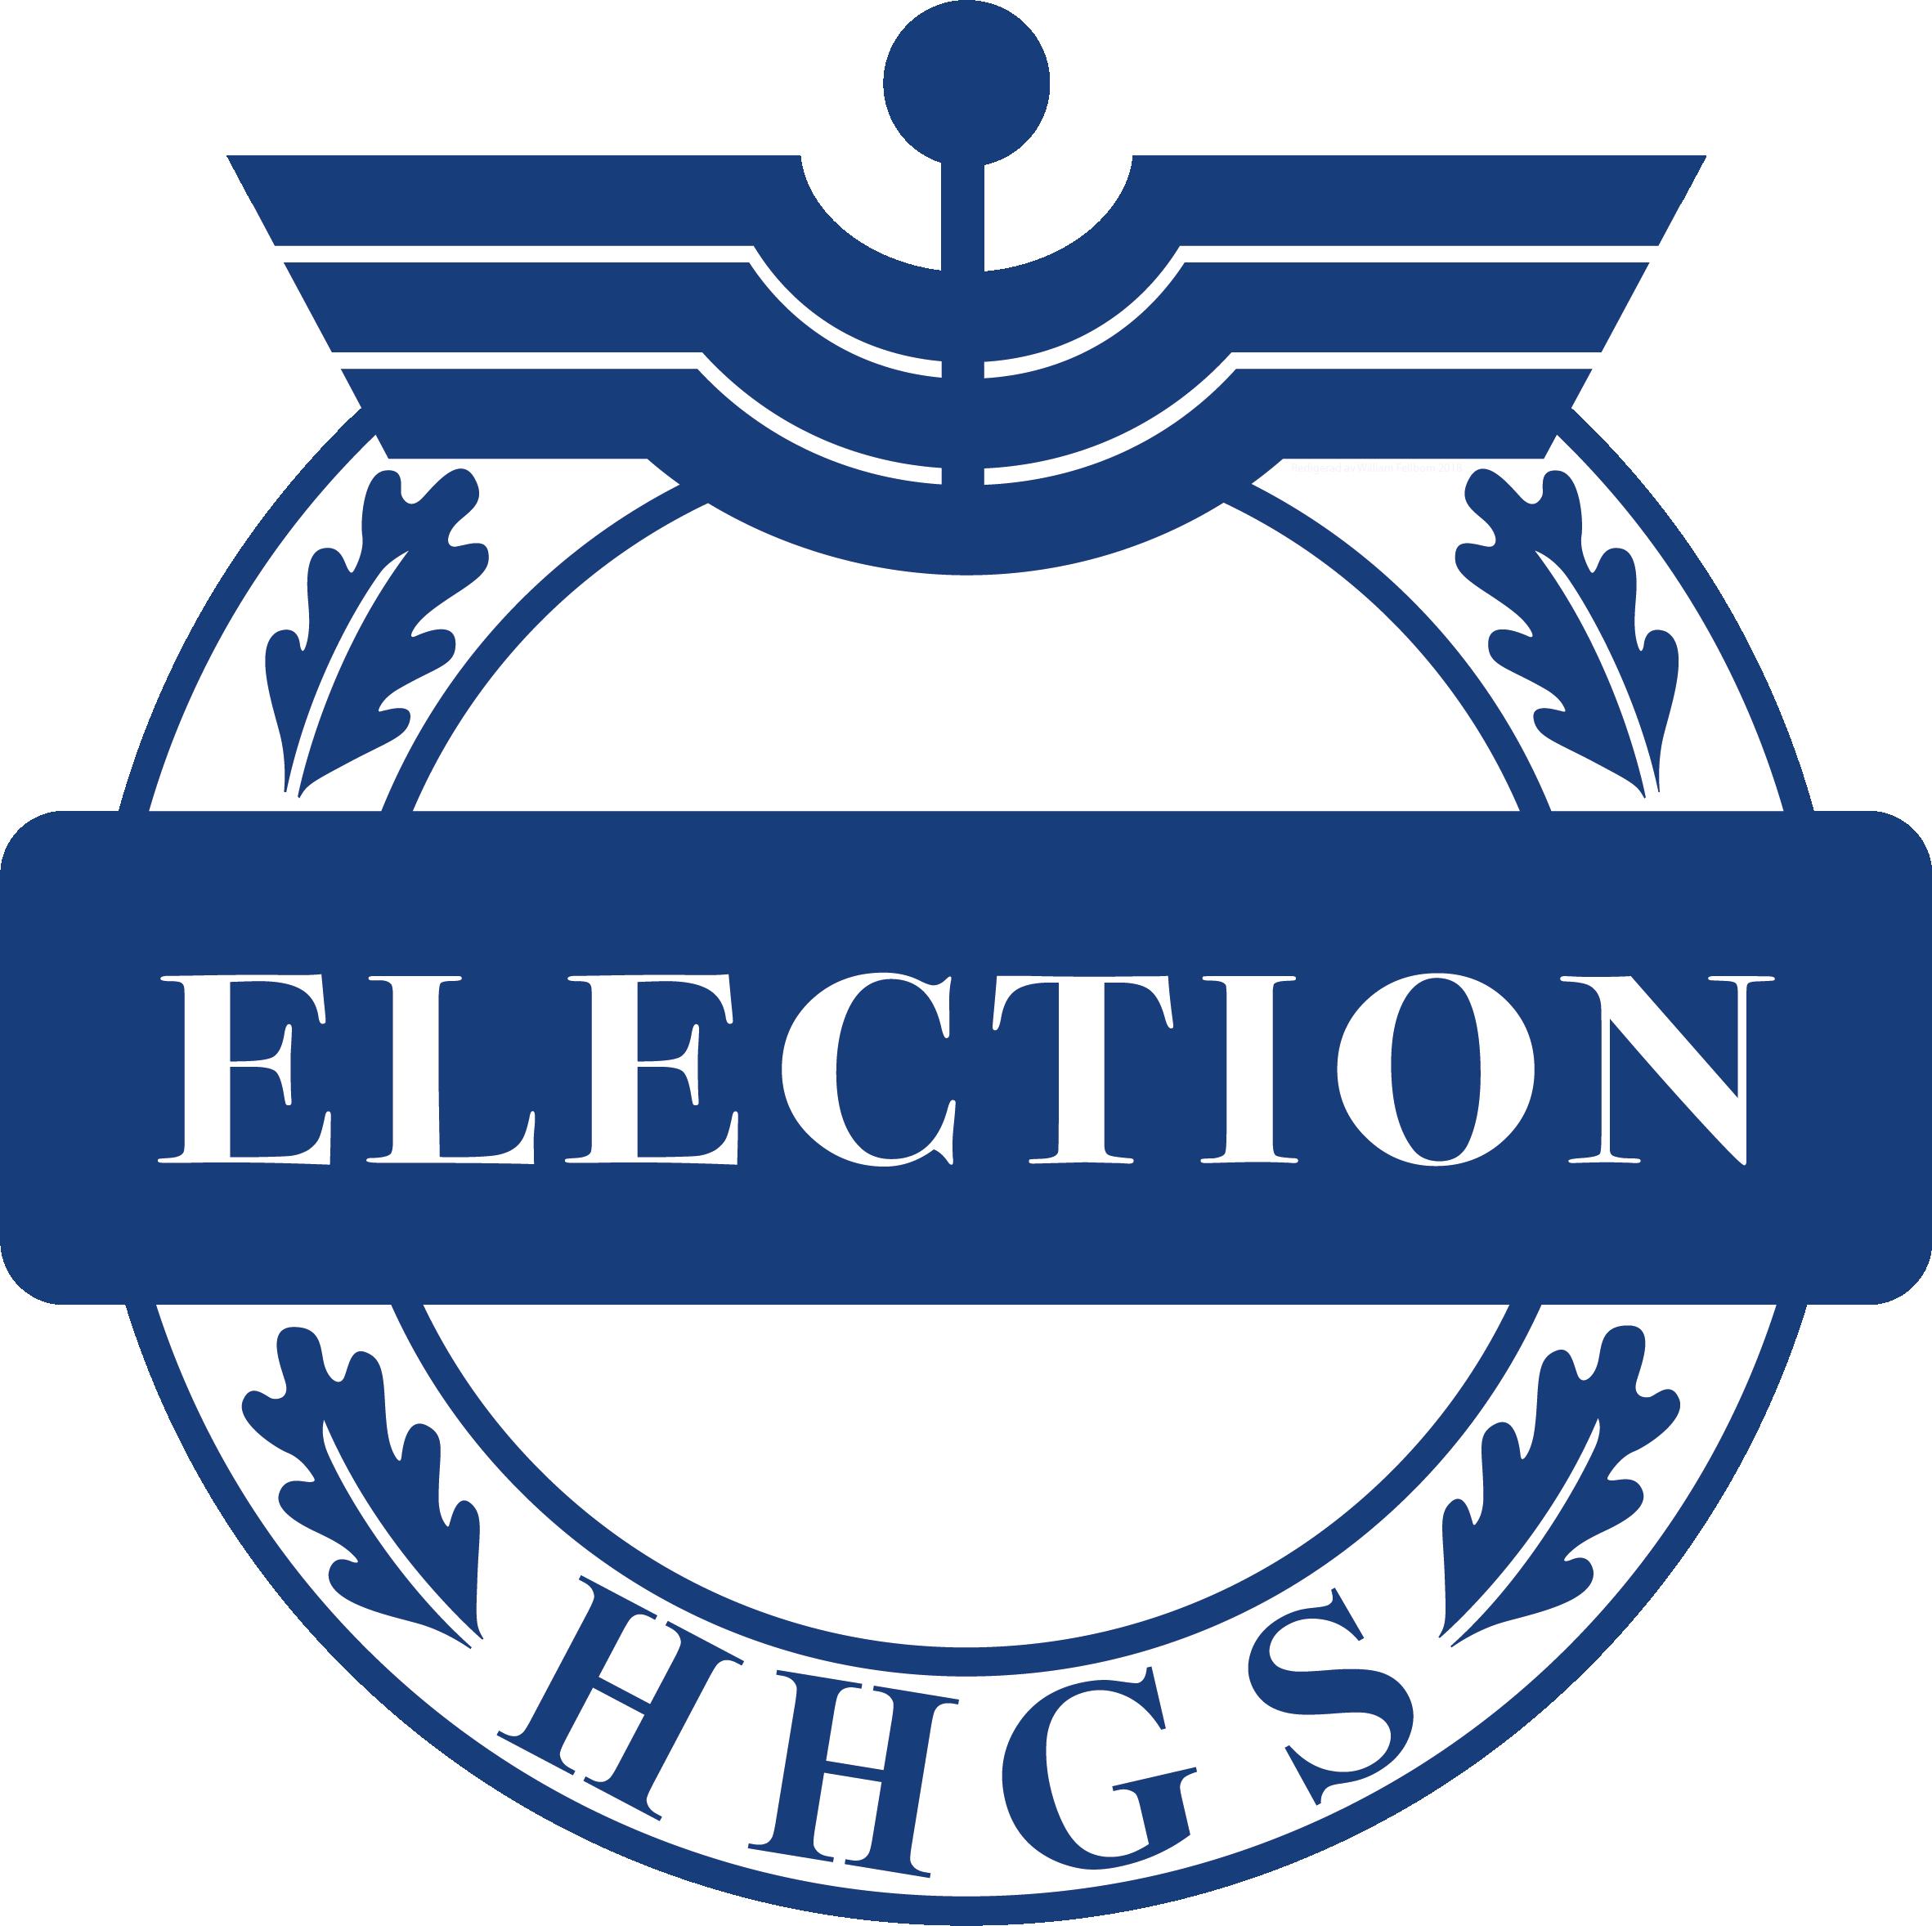 HHGS Election